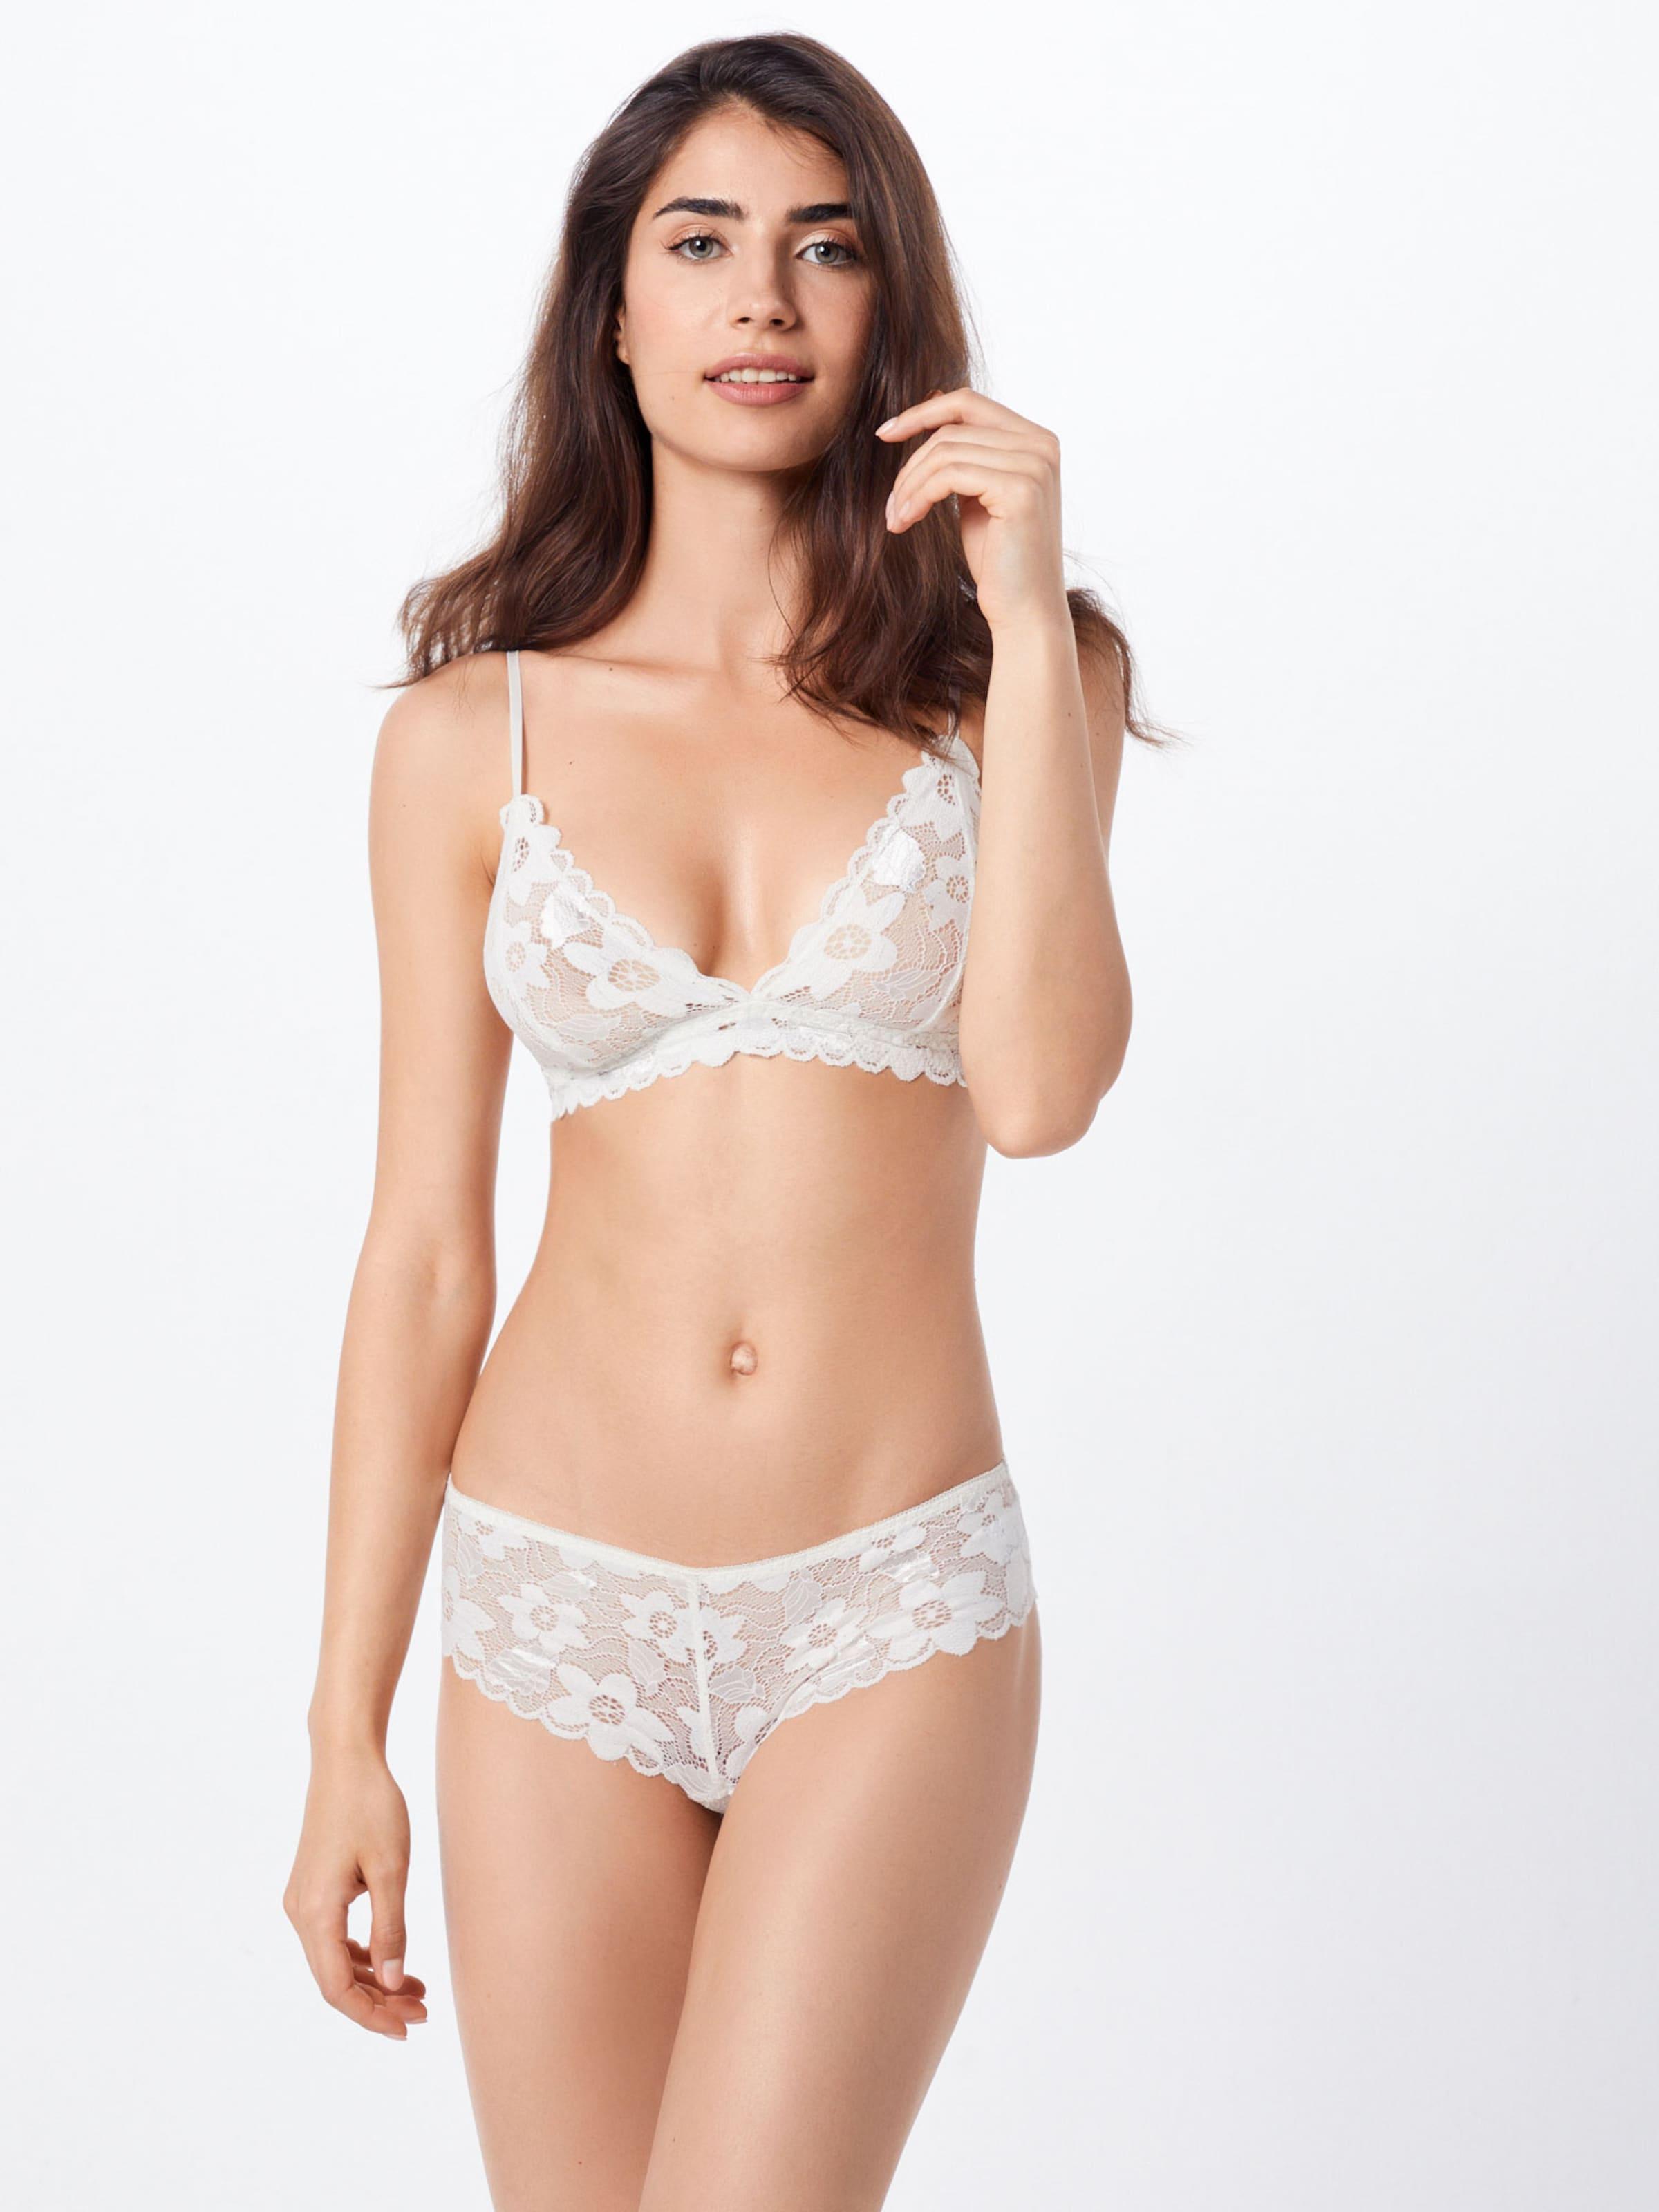 En 'tandy Samsoeamp; Noir Culotte Panties 6356' SjLq4c35AR